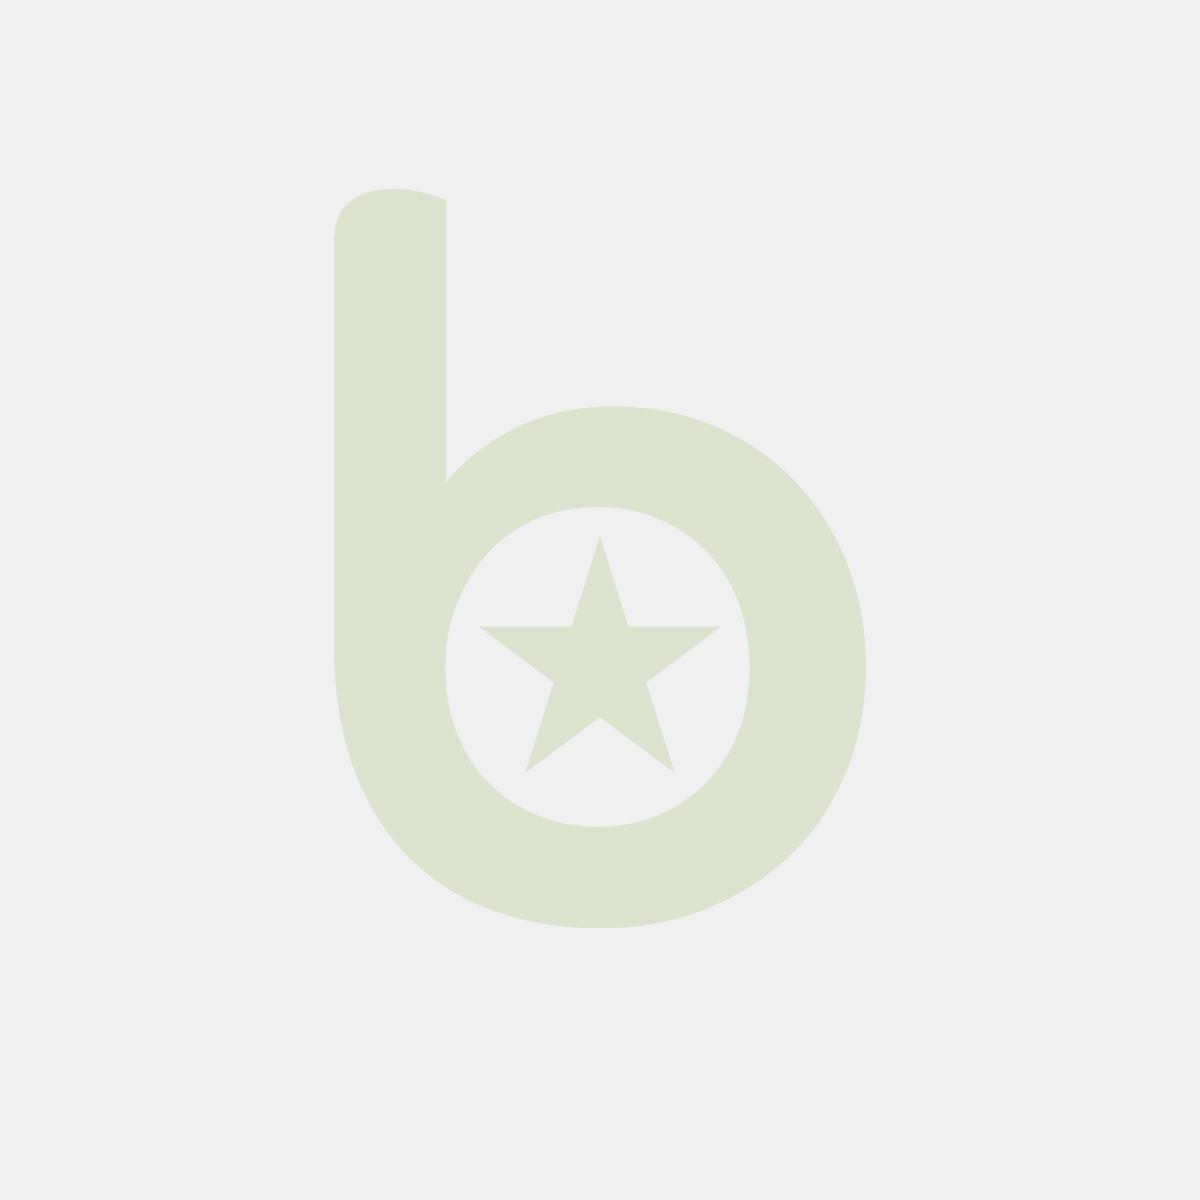 Folia bąbelkowa 5m x 0,5m DATURA